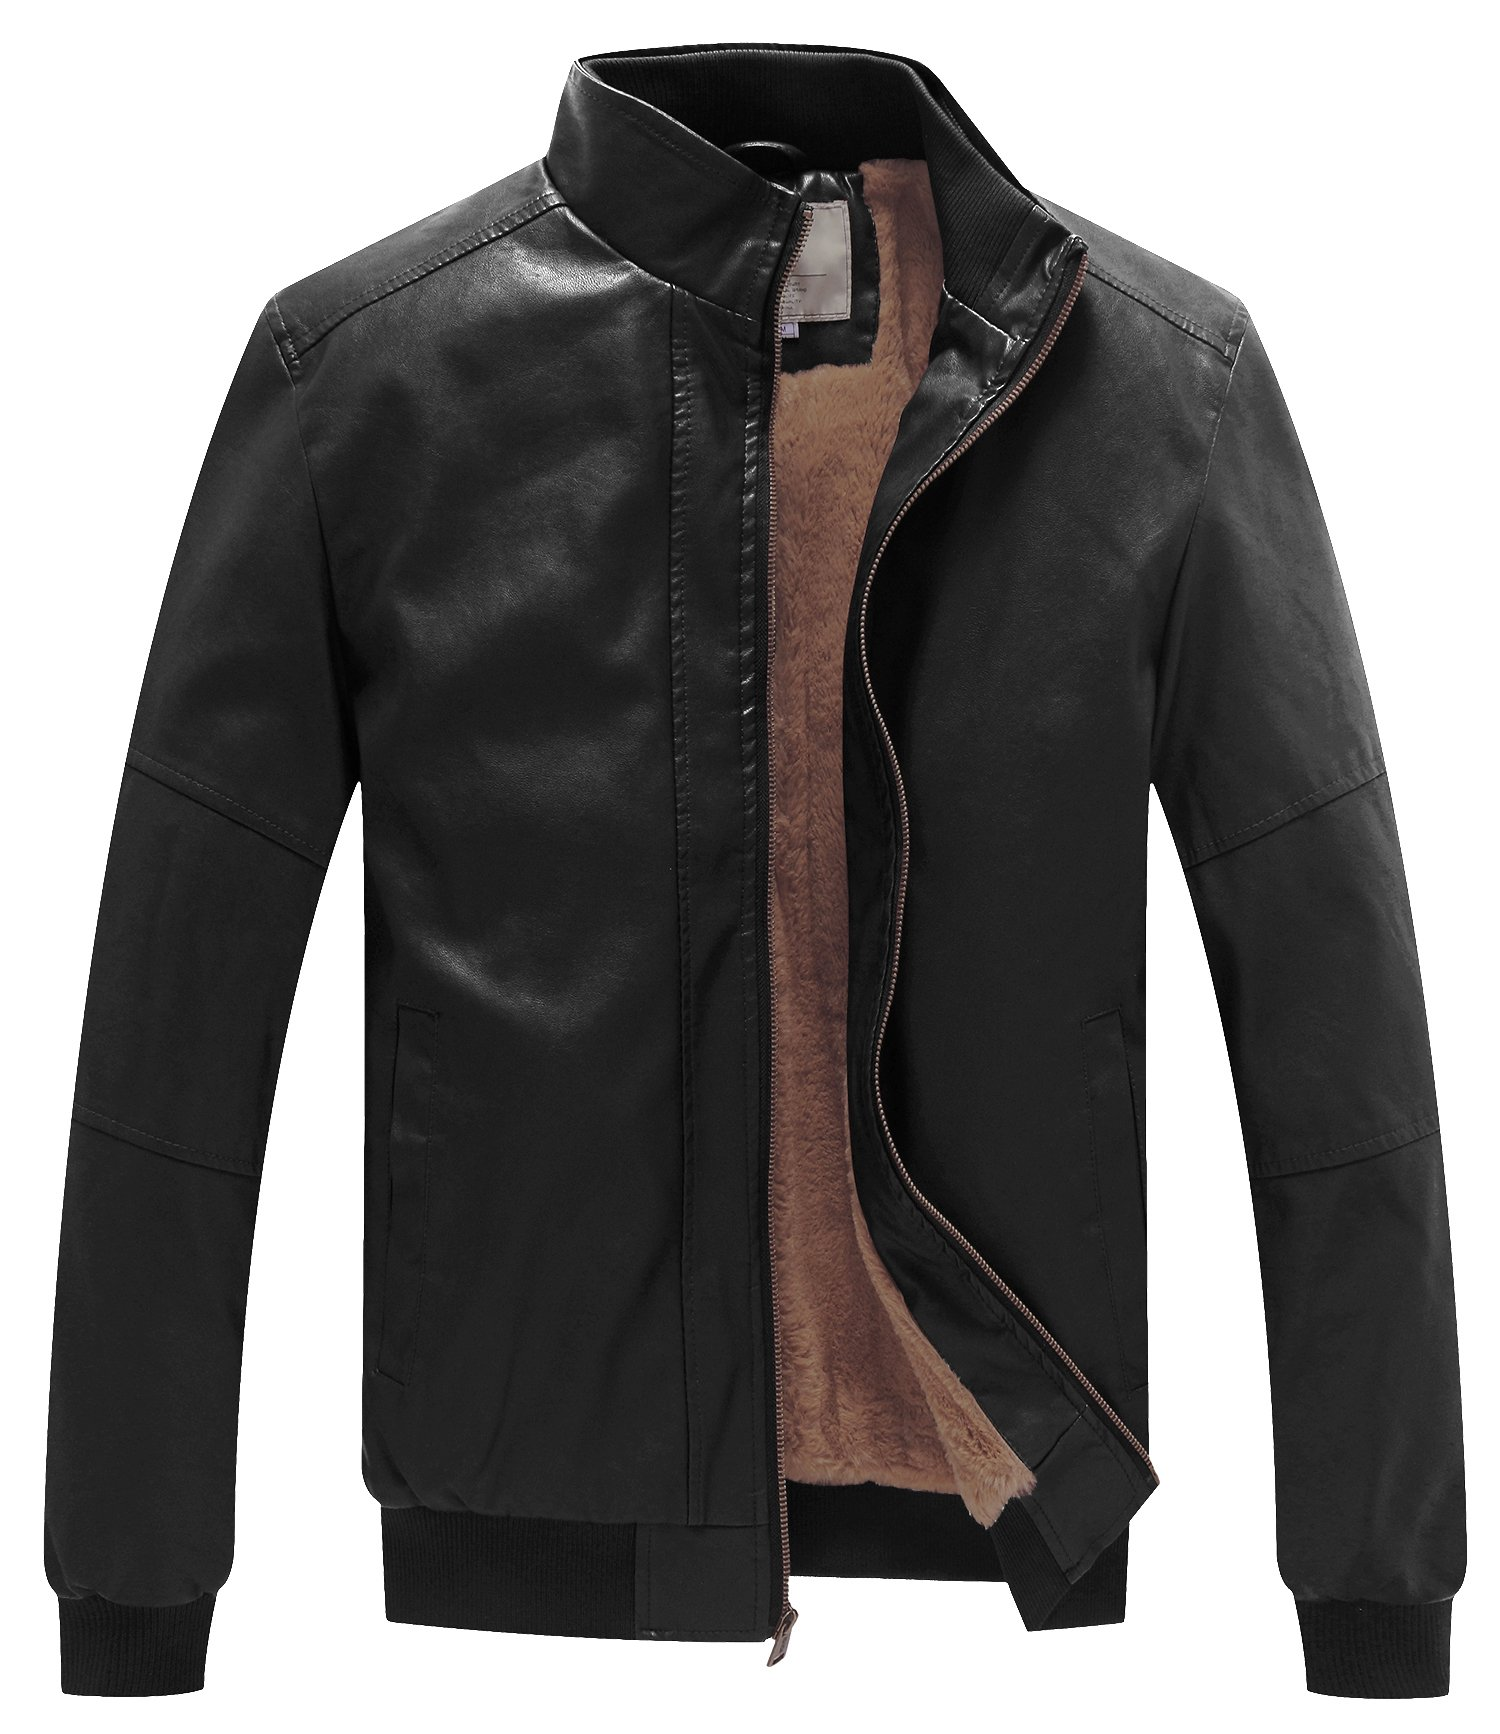 WenVen Men's Winter Fashion Faux Leather Jackets (Black, Medium)